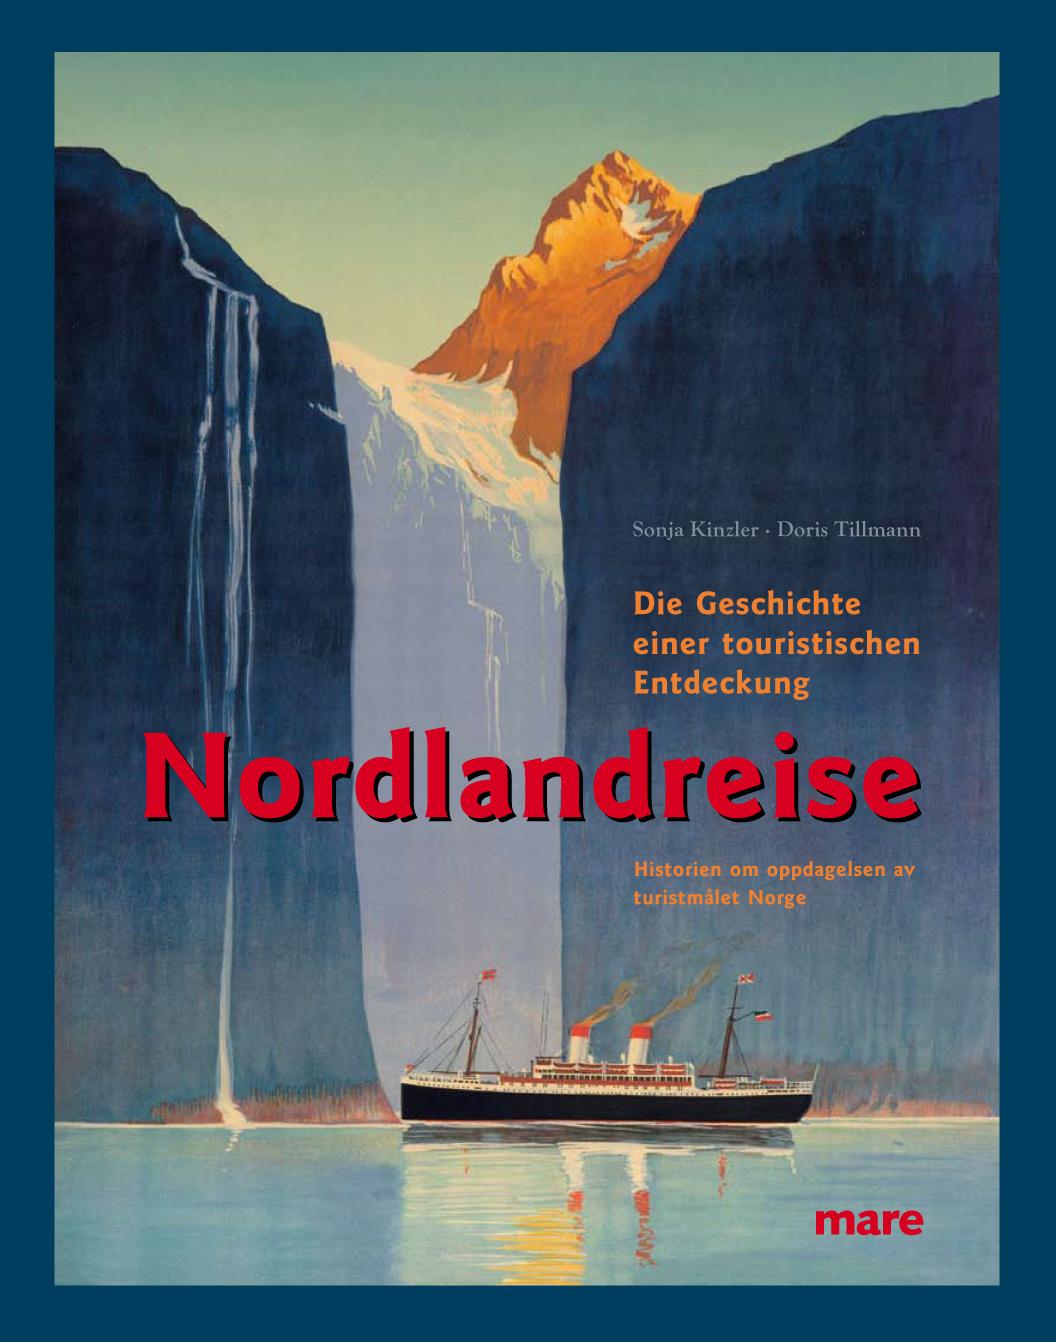 Nordlandreise